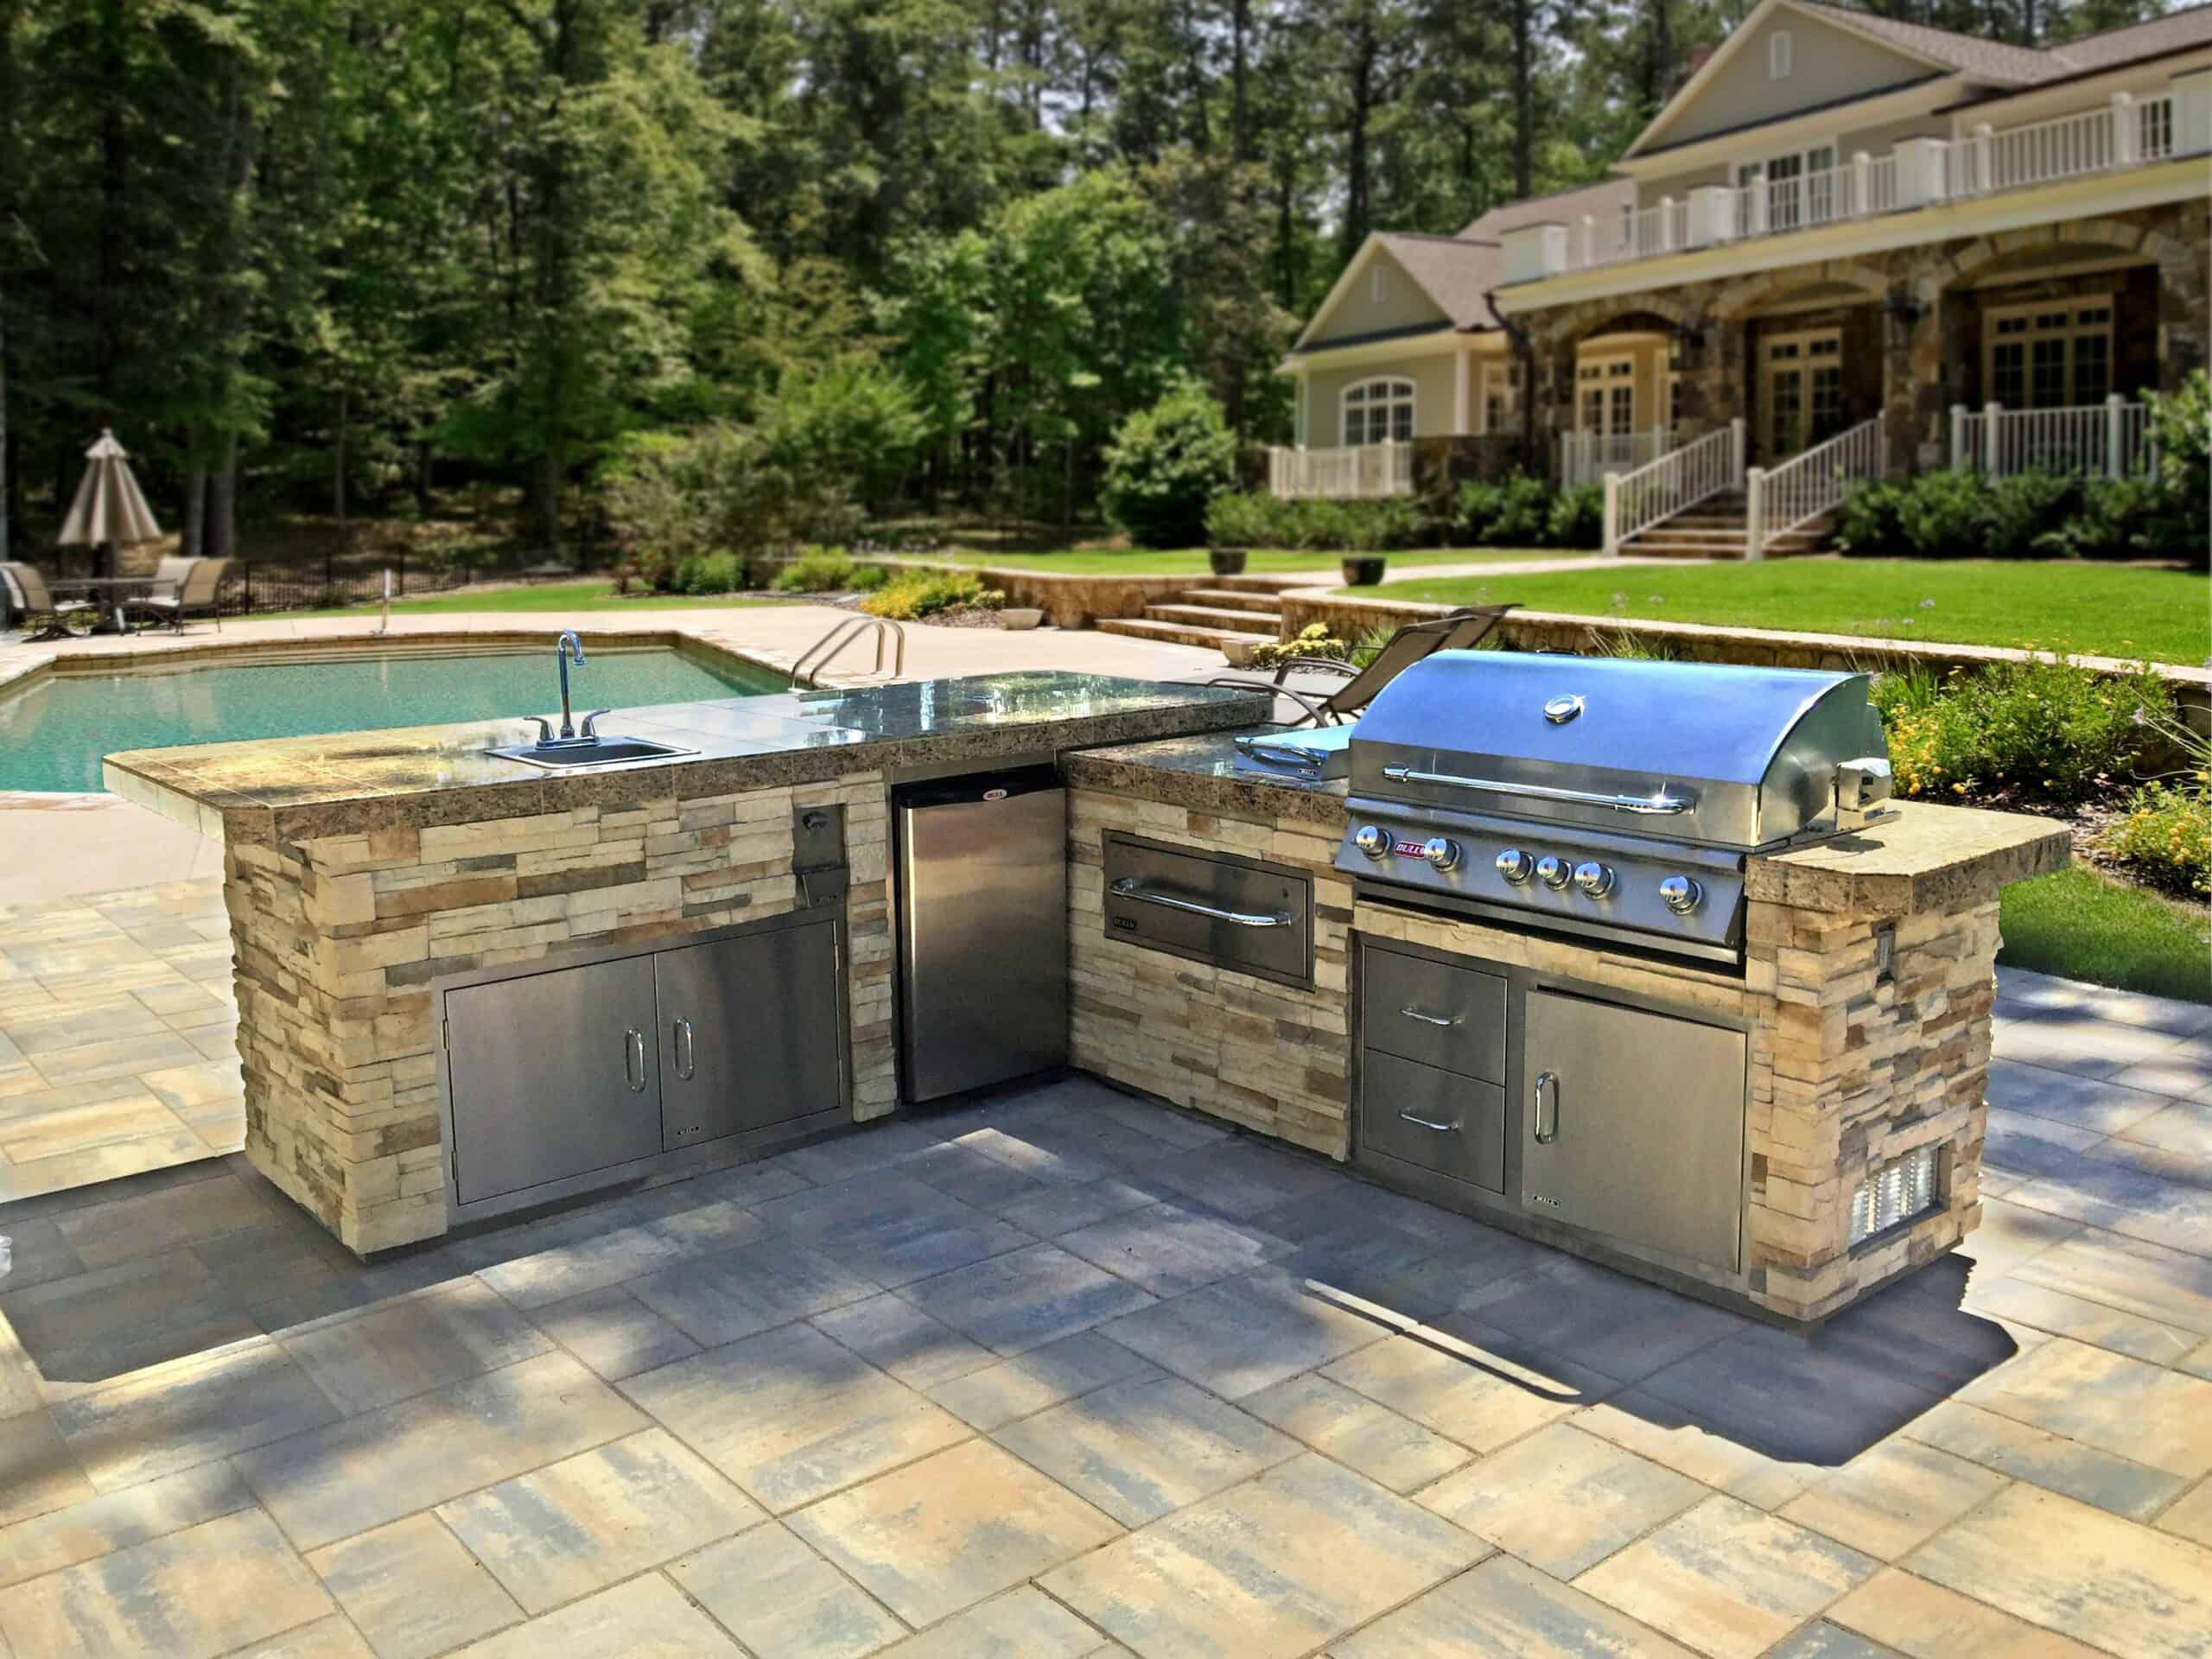 14 Outdoor Kitchen Island Ideas